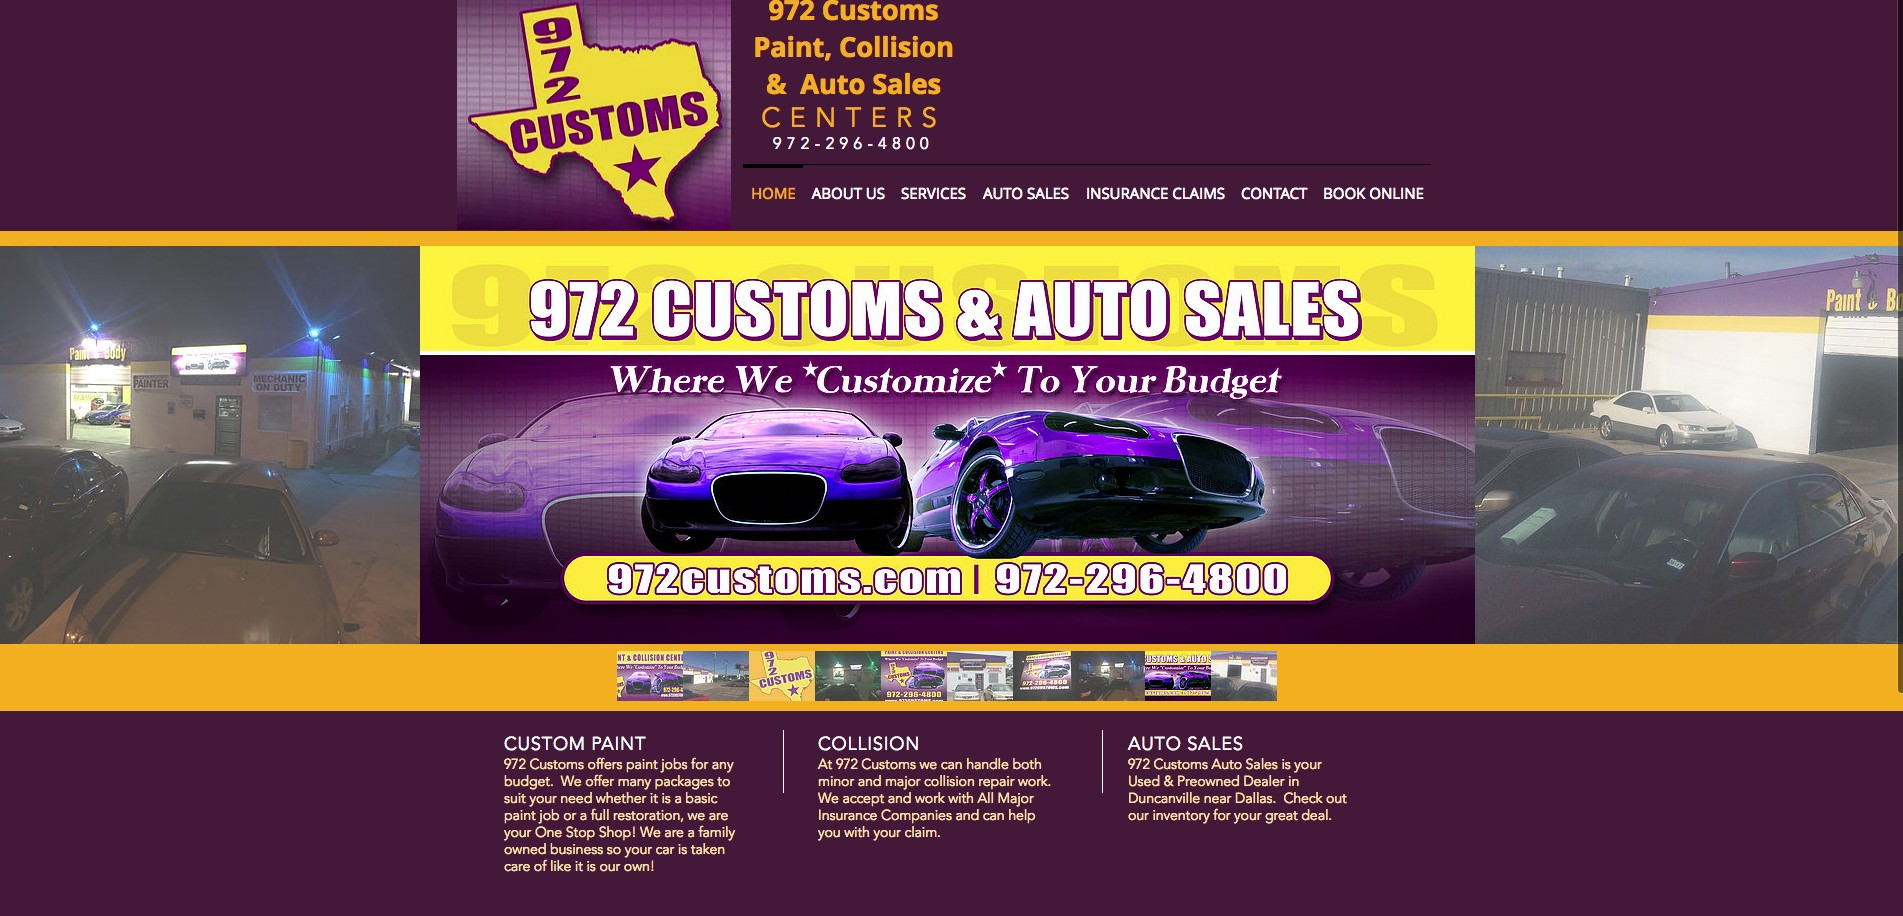 Custom Auto Sales >> 972 Customs Paint Collision Auto Sales Centers Linkedin